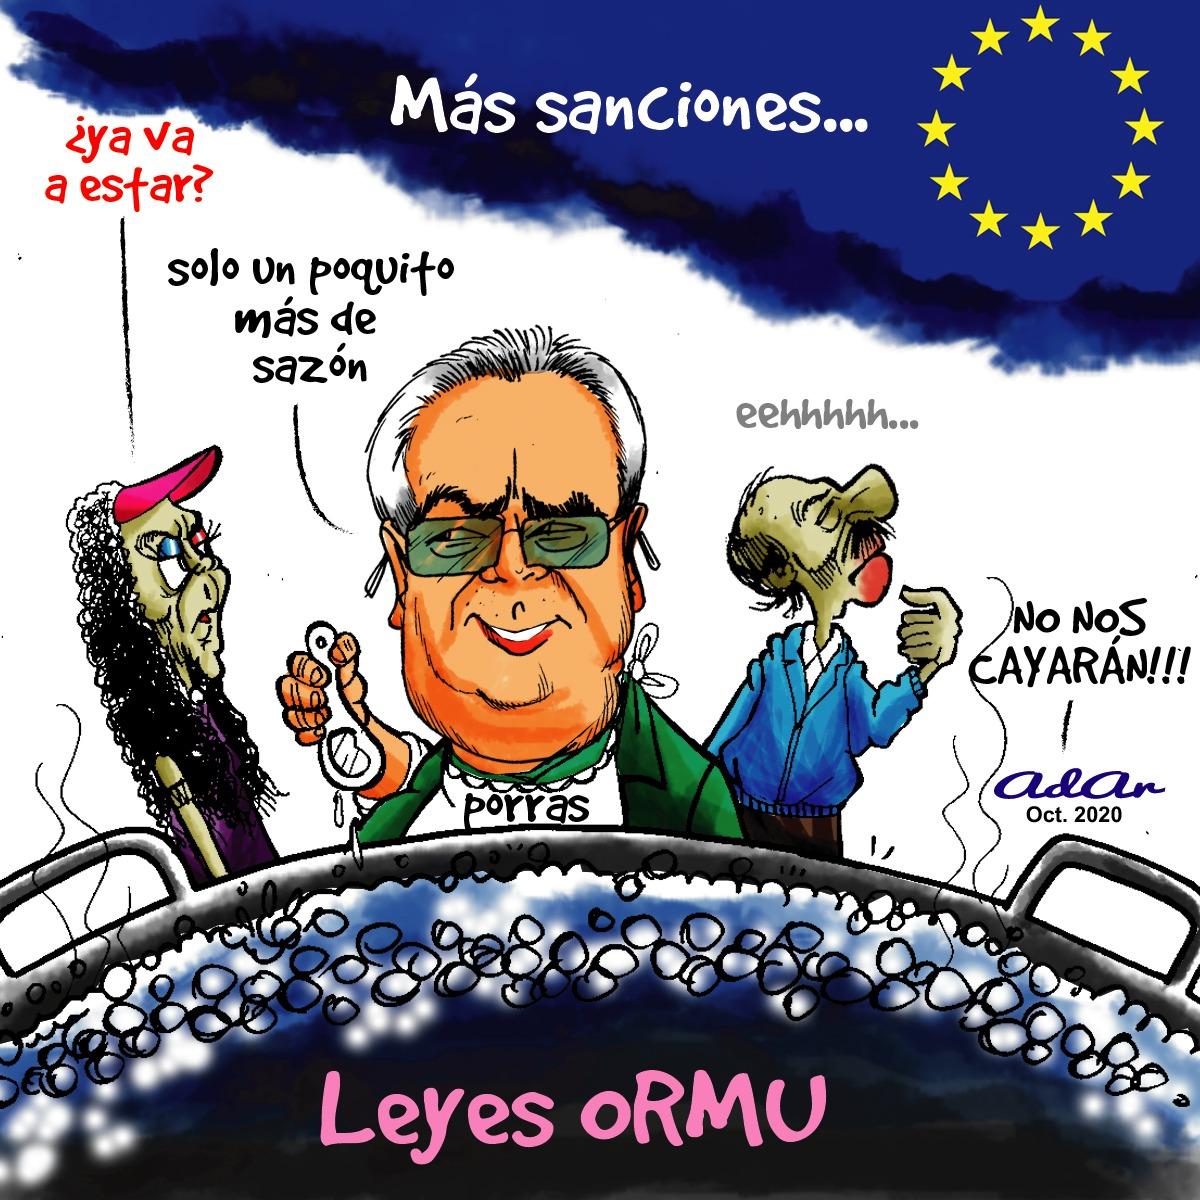 caricatura ip nicaragua 08 2